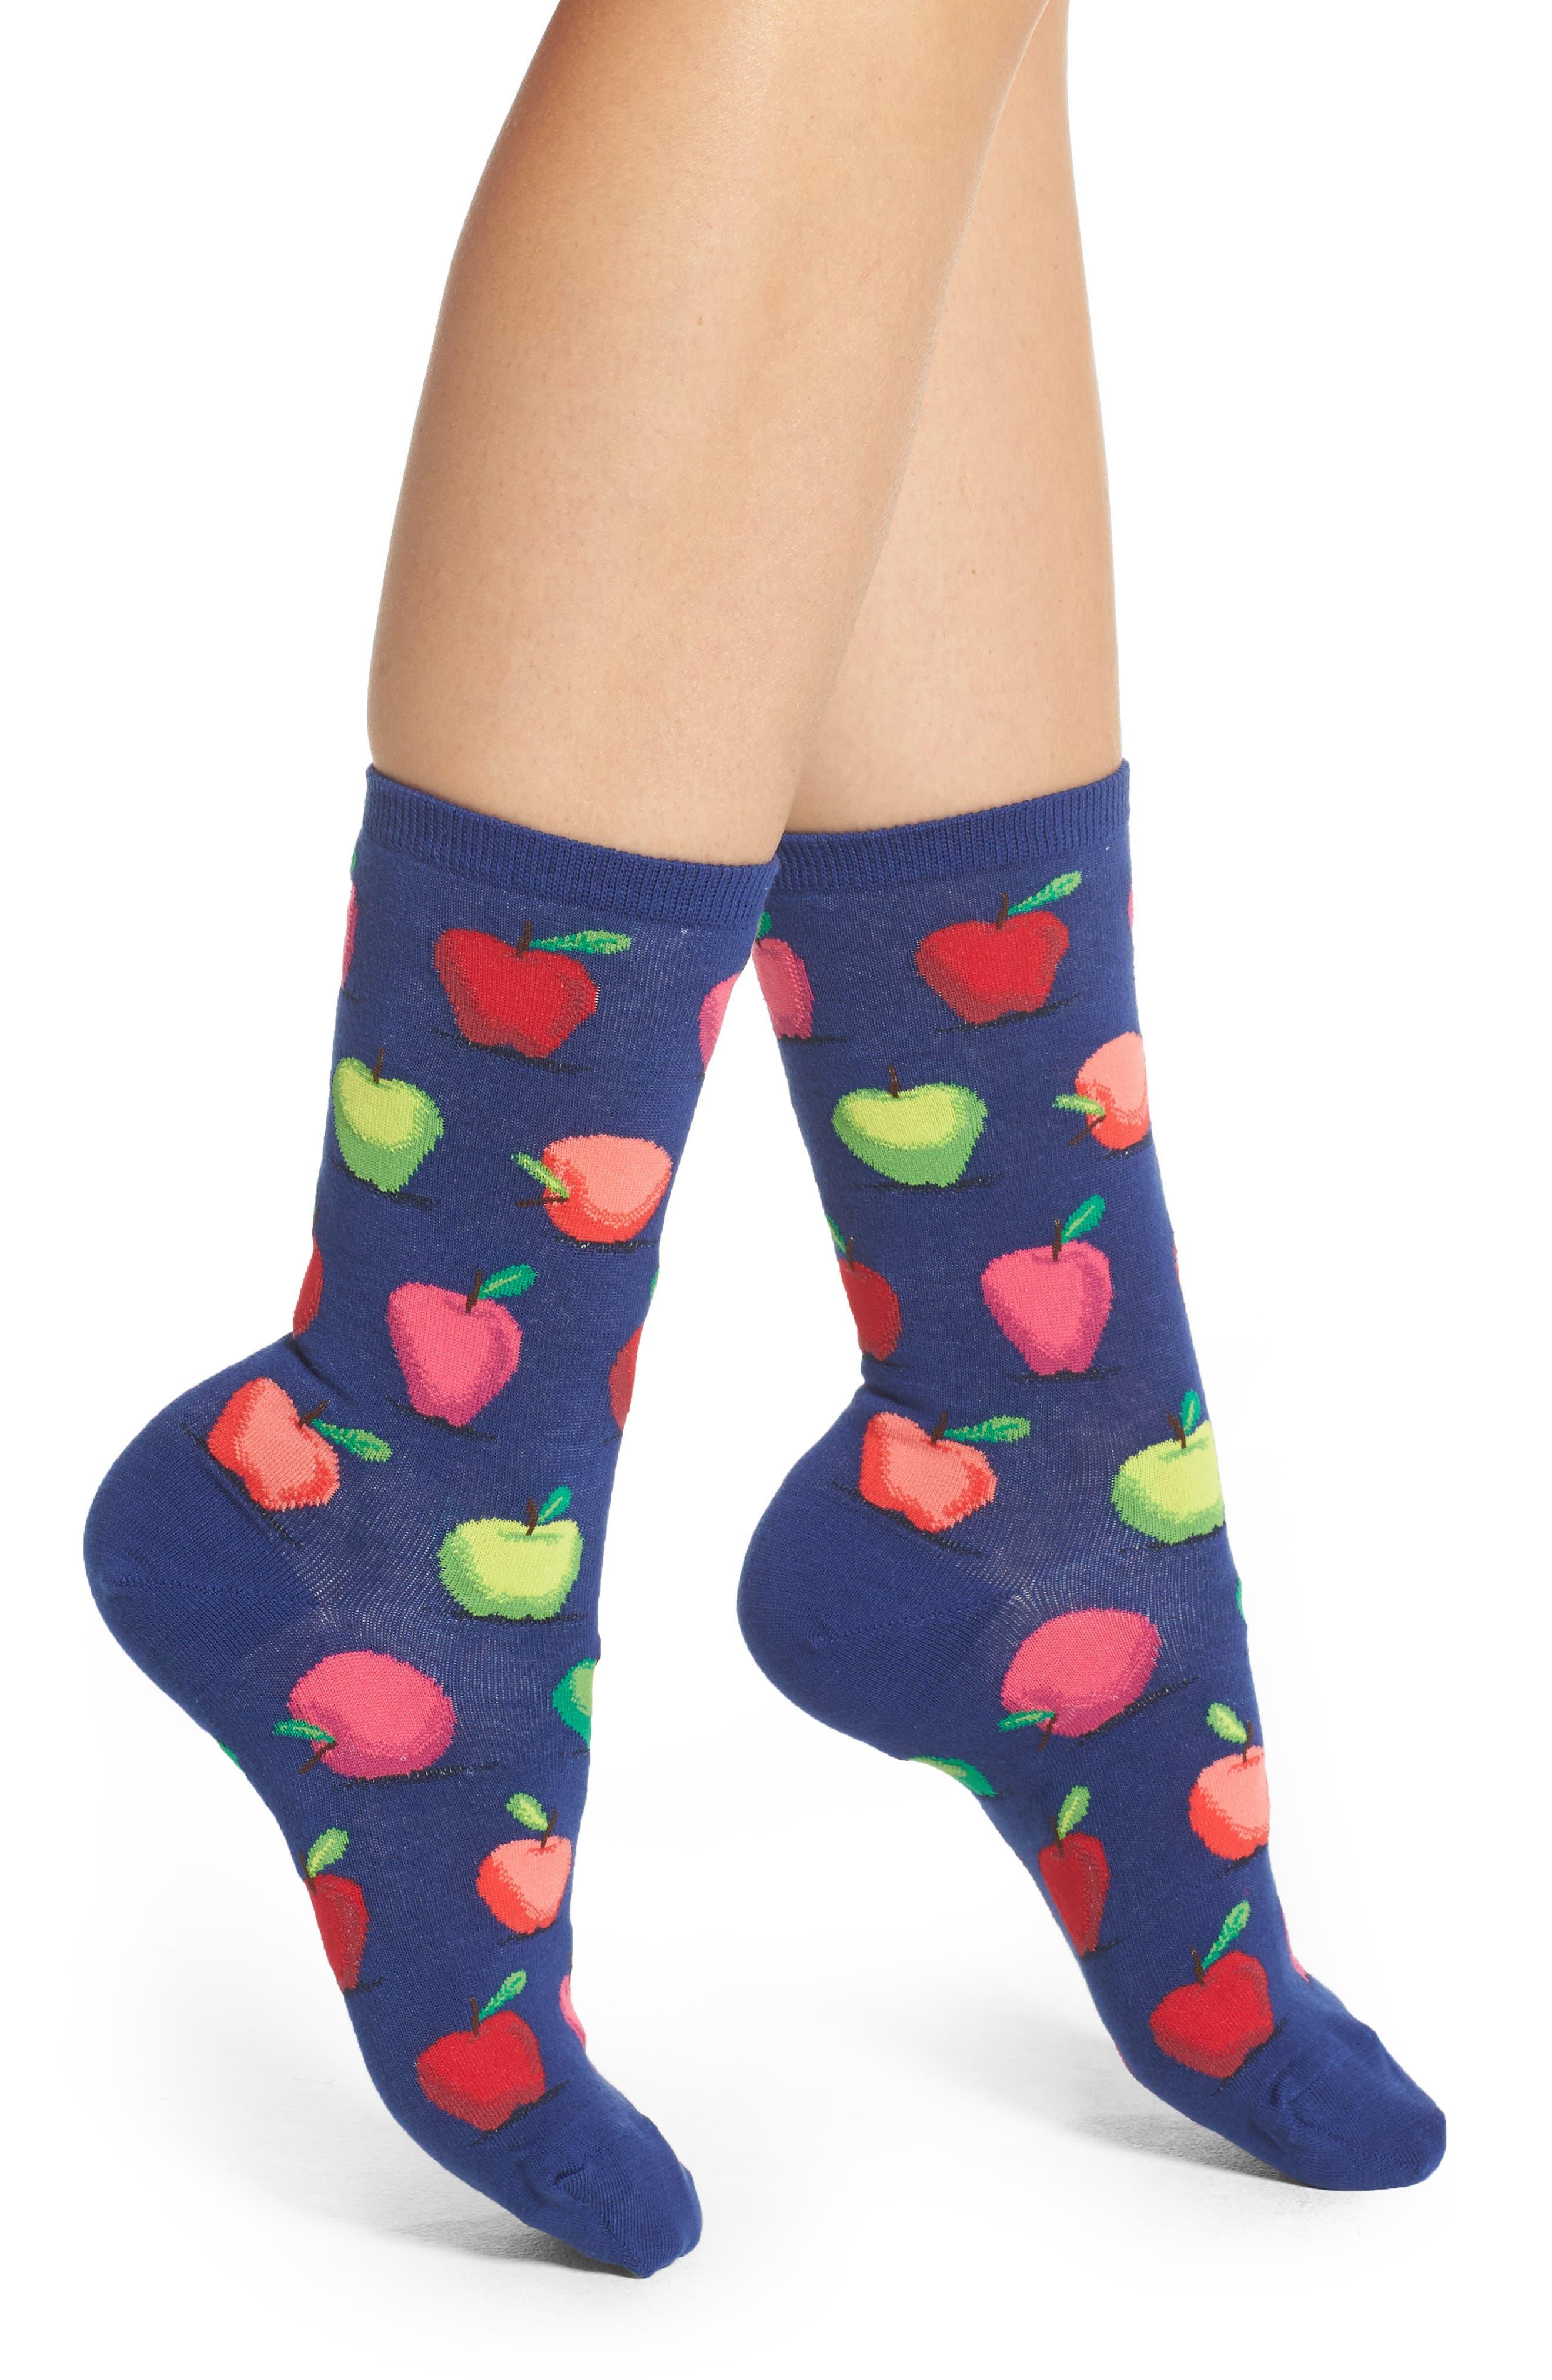 Alternate Image 1 Selected - Hot Sox Apples Crew Socks